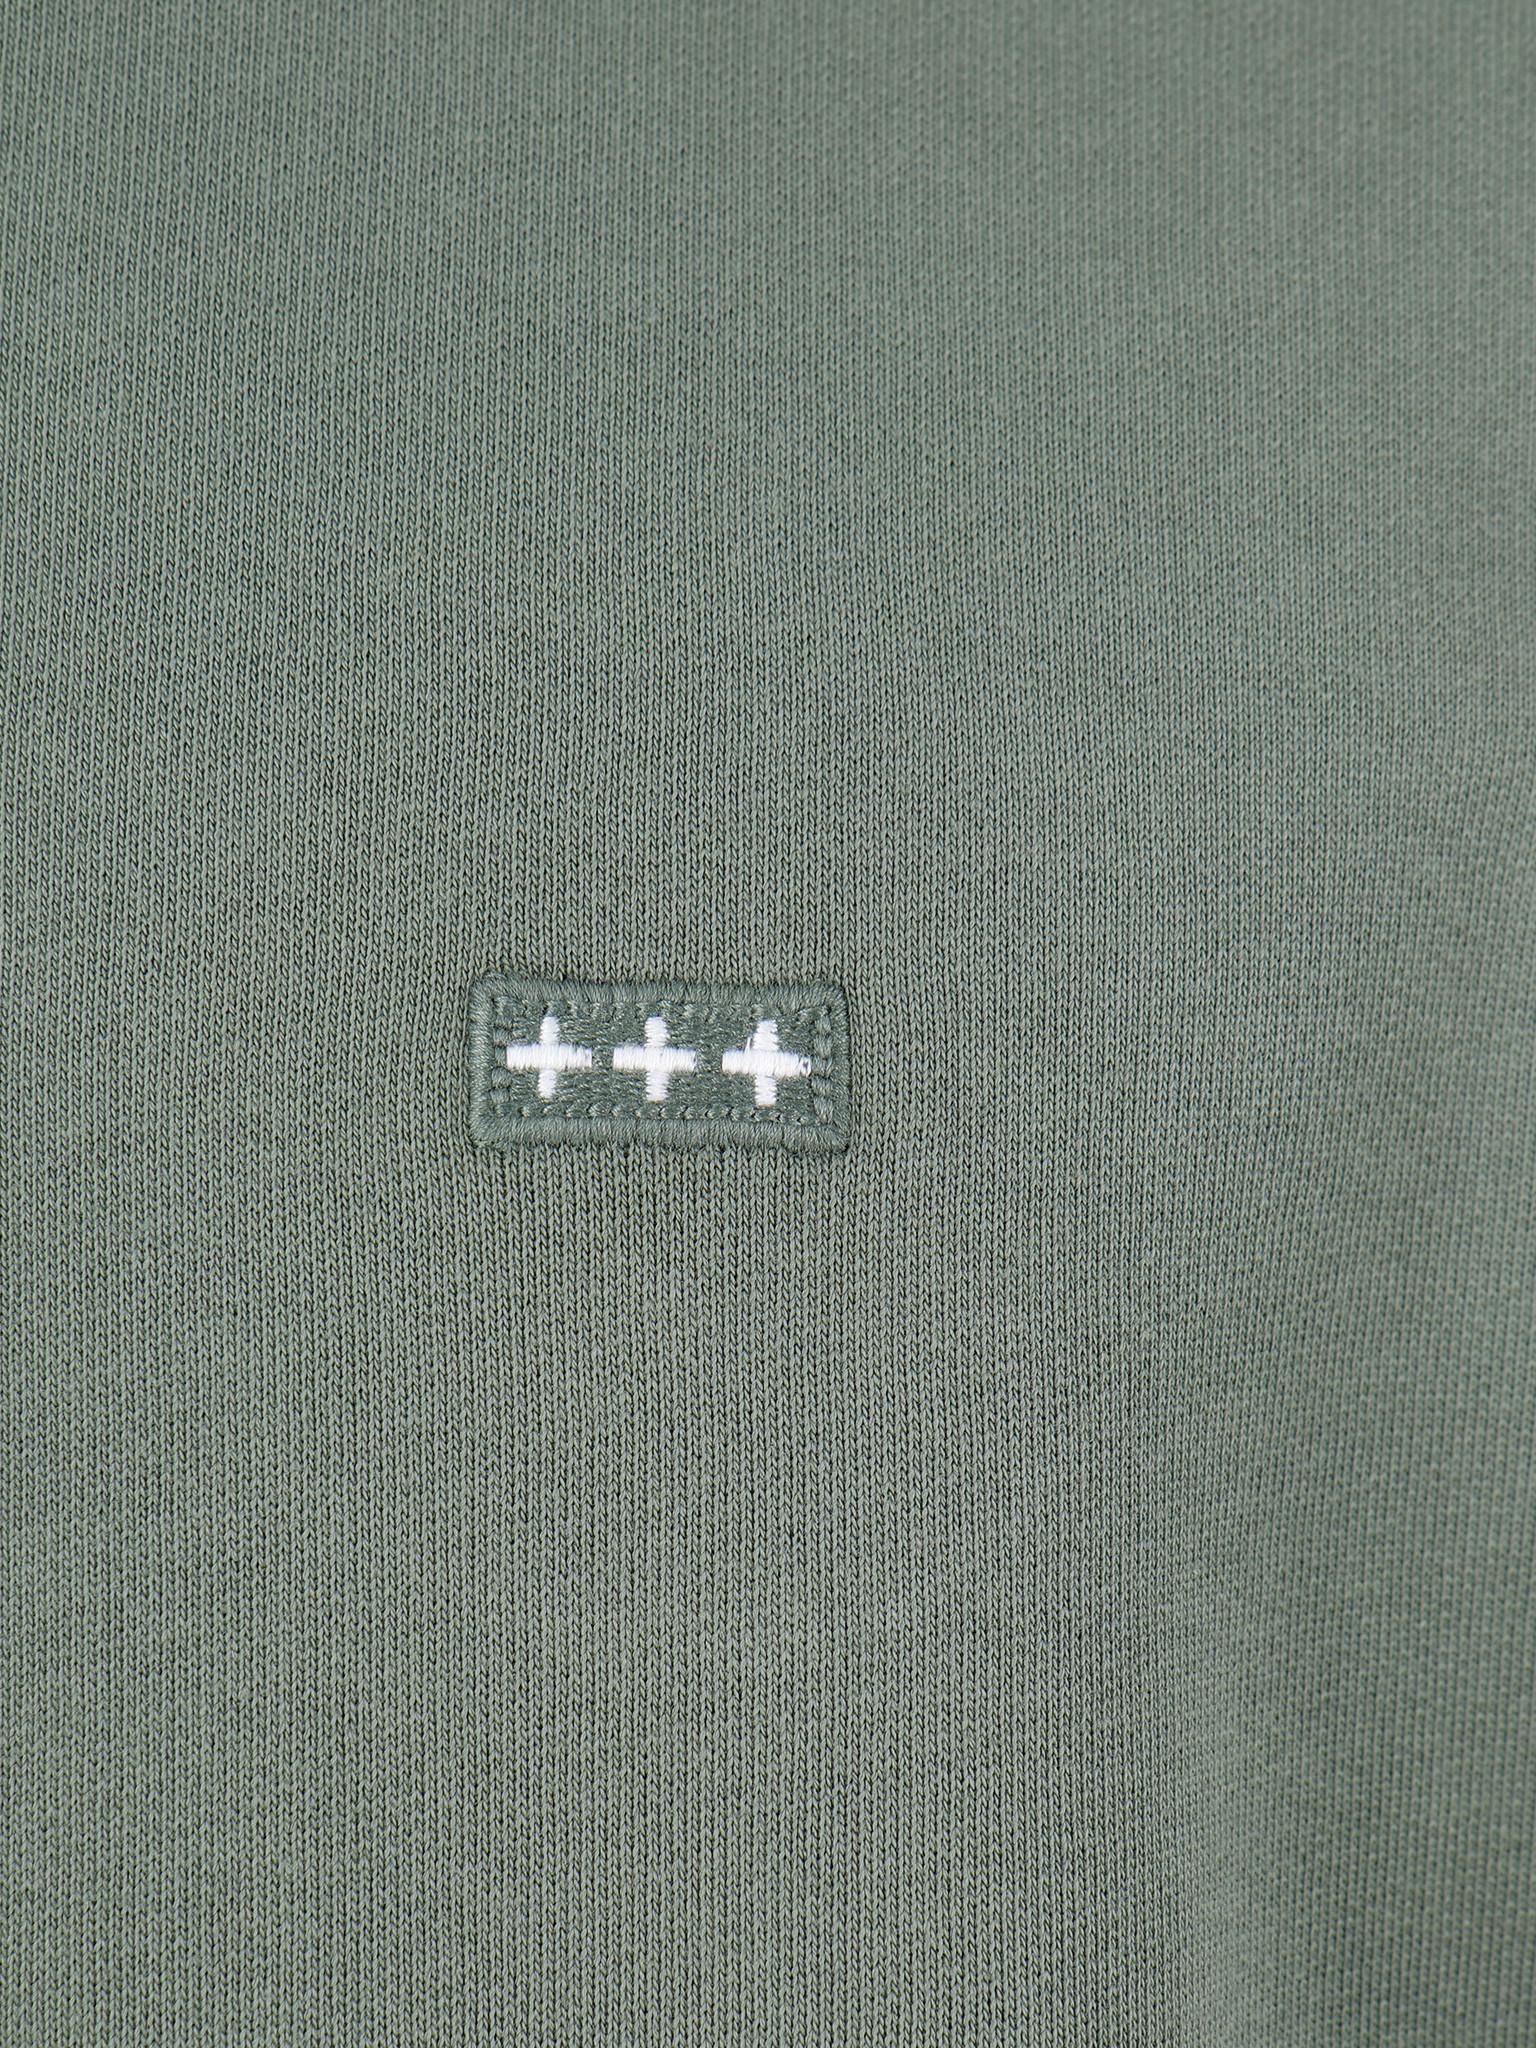 Quality Blanks Quality Blanks QB94 Patch Logo Crewneck Olive Green